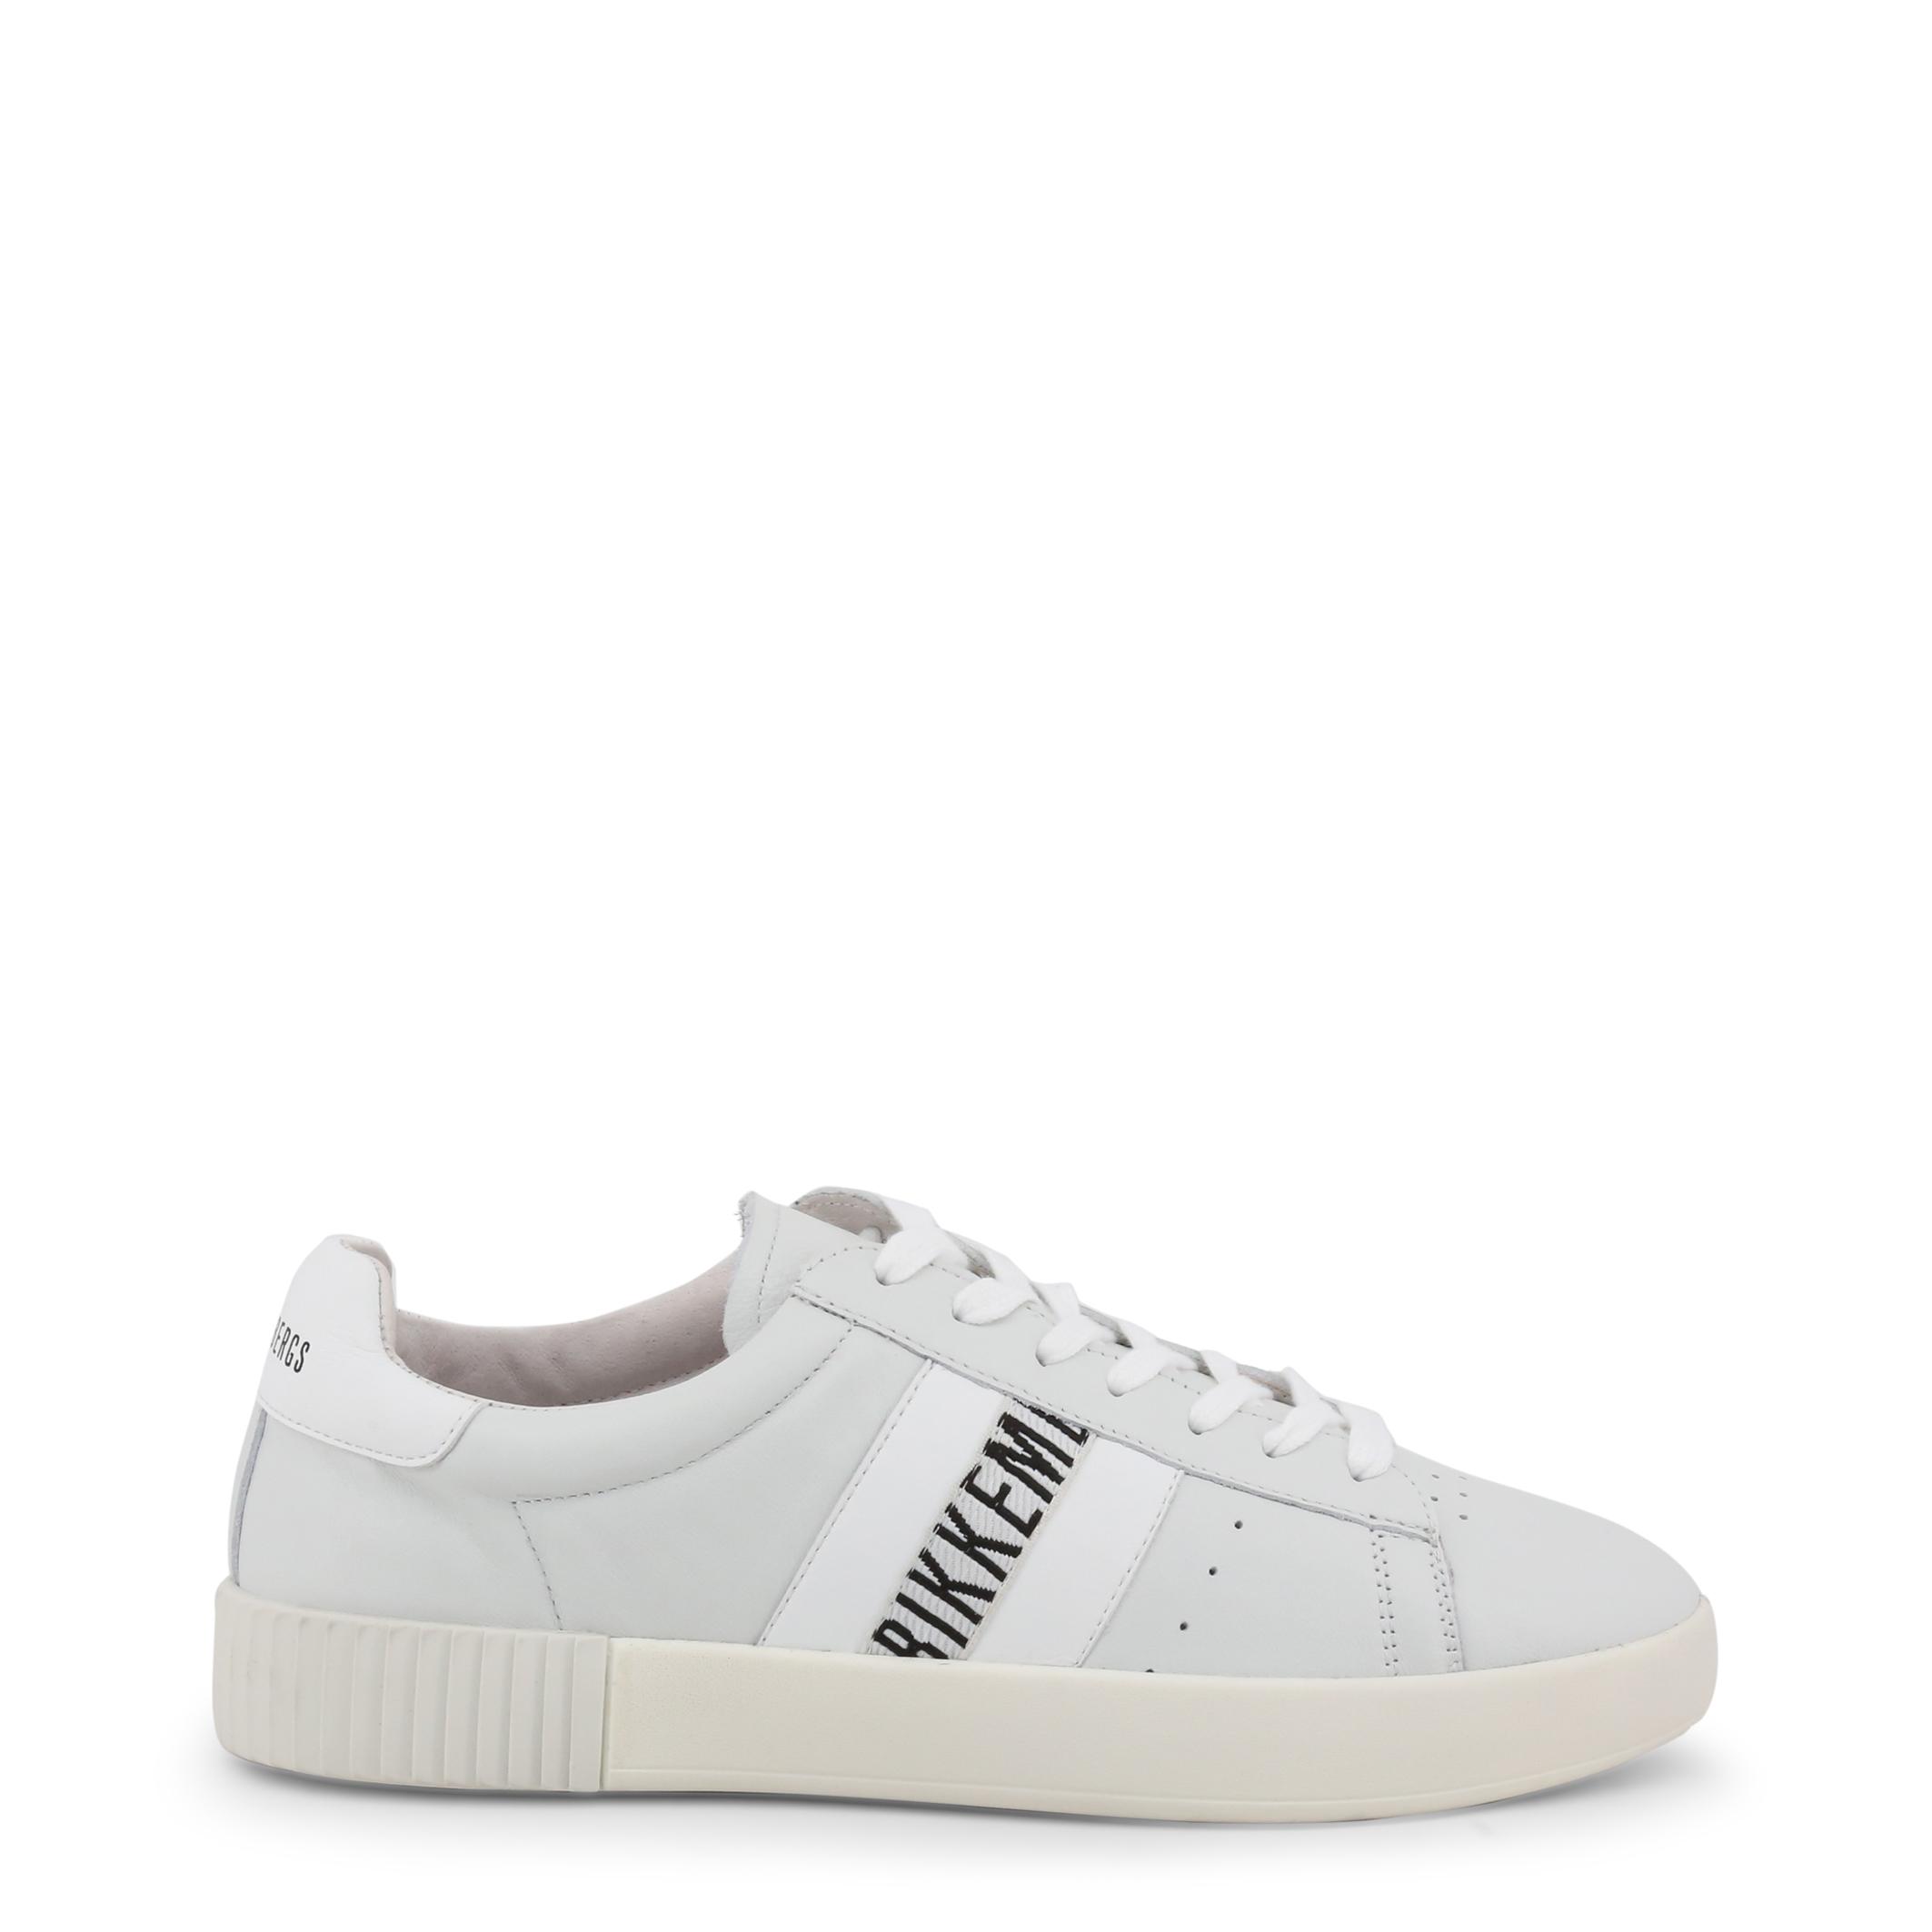 Chaussures de ville  Bikkembergs COSMOS_2434 white